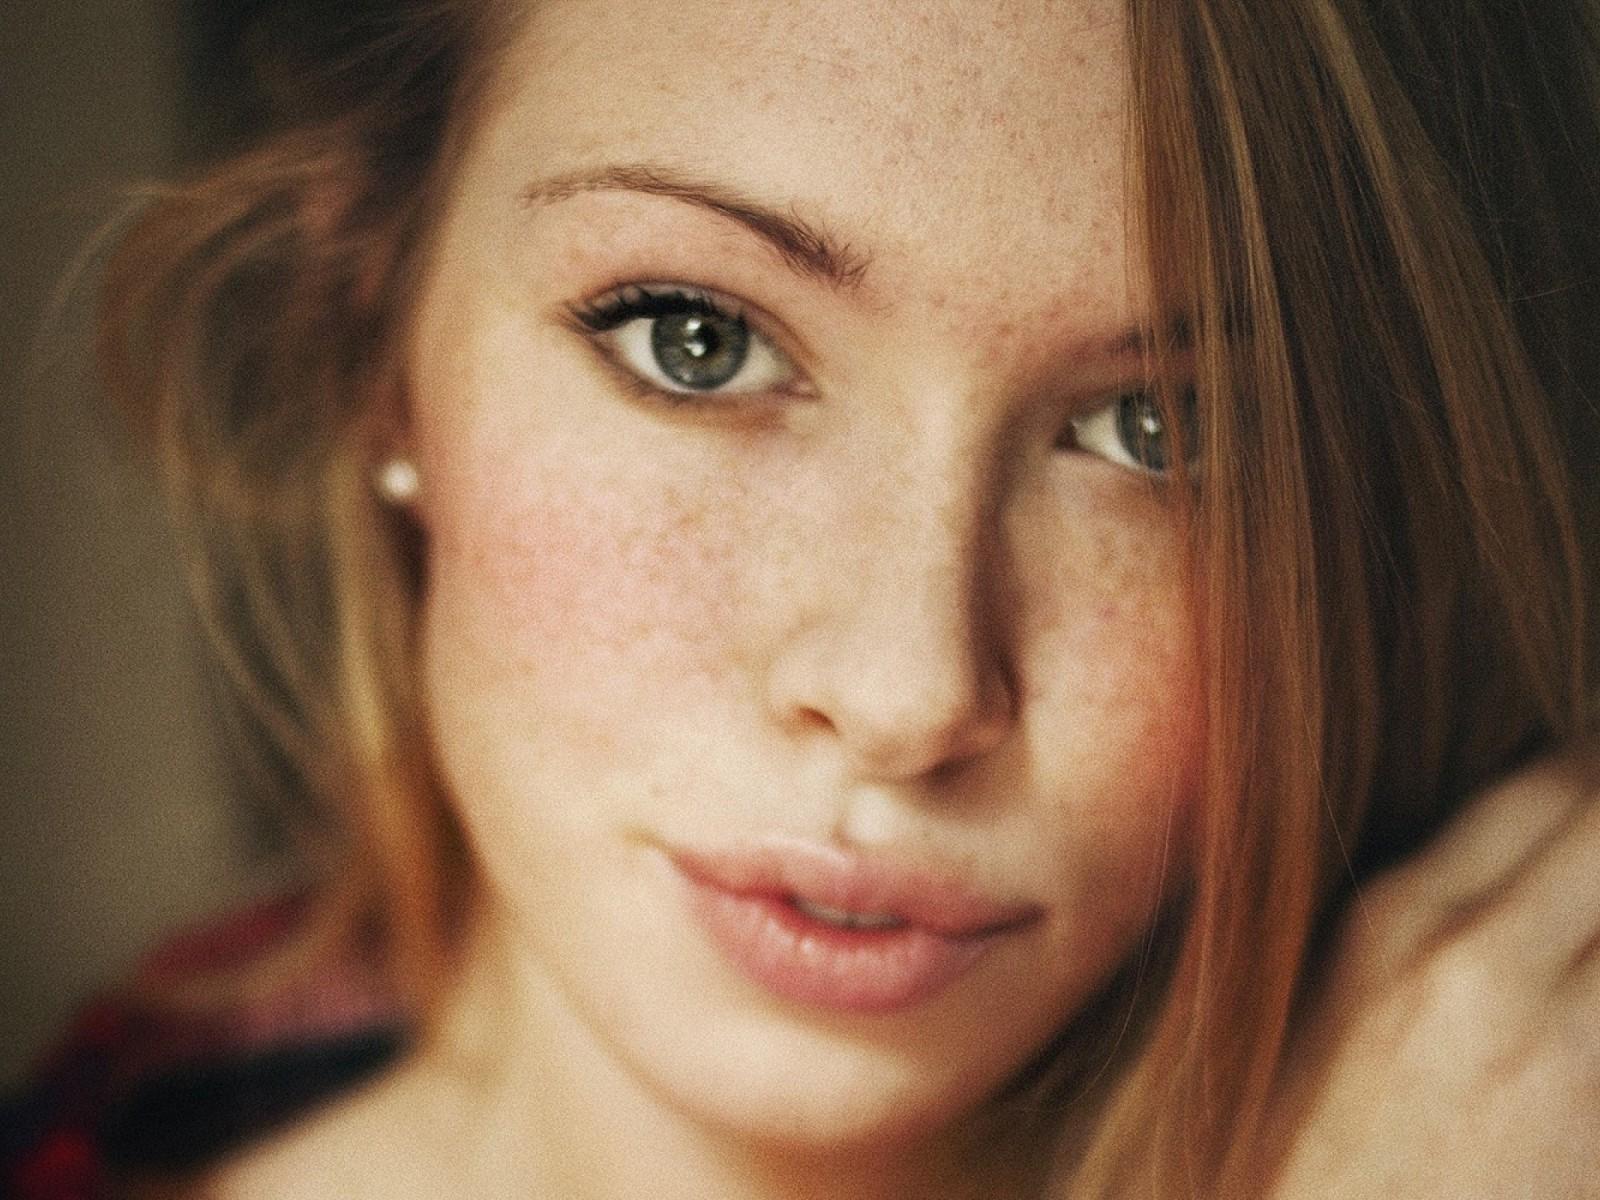 Quiet Girl Wallpaper Download Women Face Freckles Wallpapers Hd Desktop And Mobile